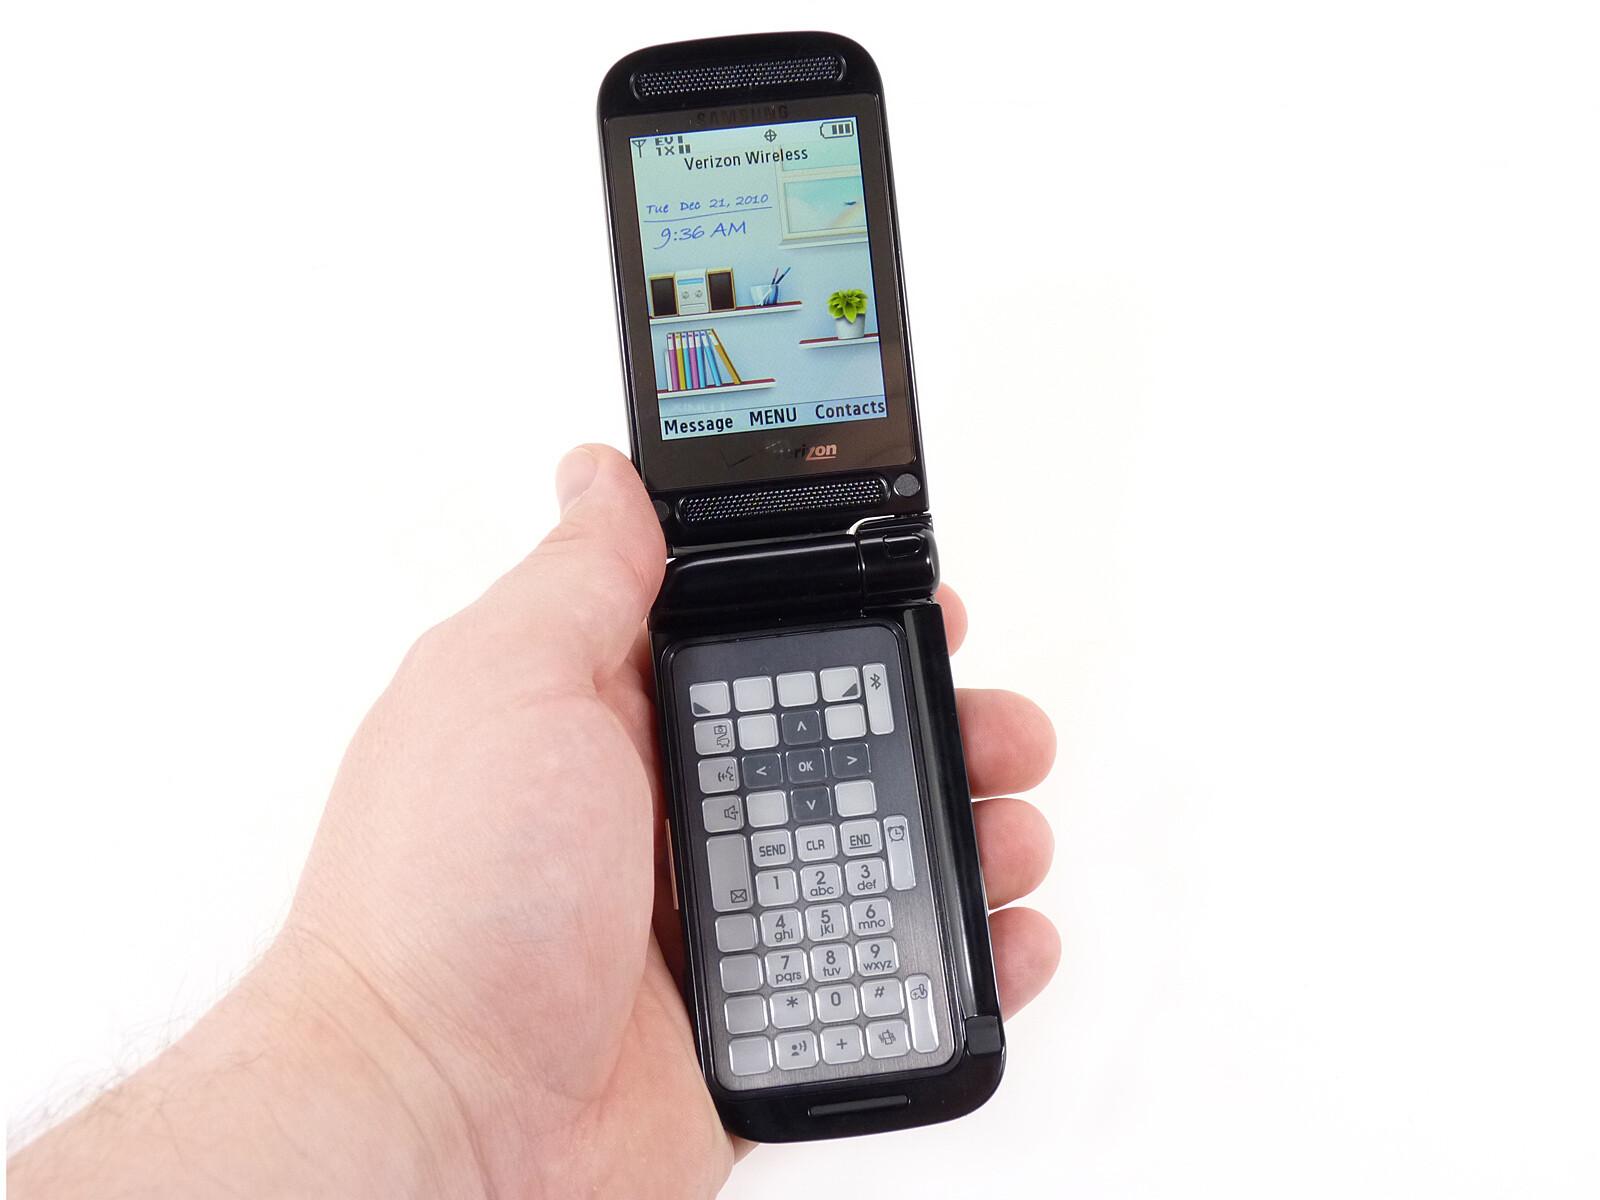 samsung zeal photos rh phonearena com Samsung Alias 2 Zeal vs Samsung Zeal Battery